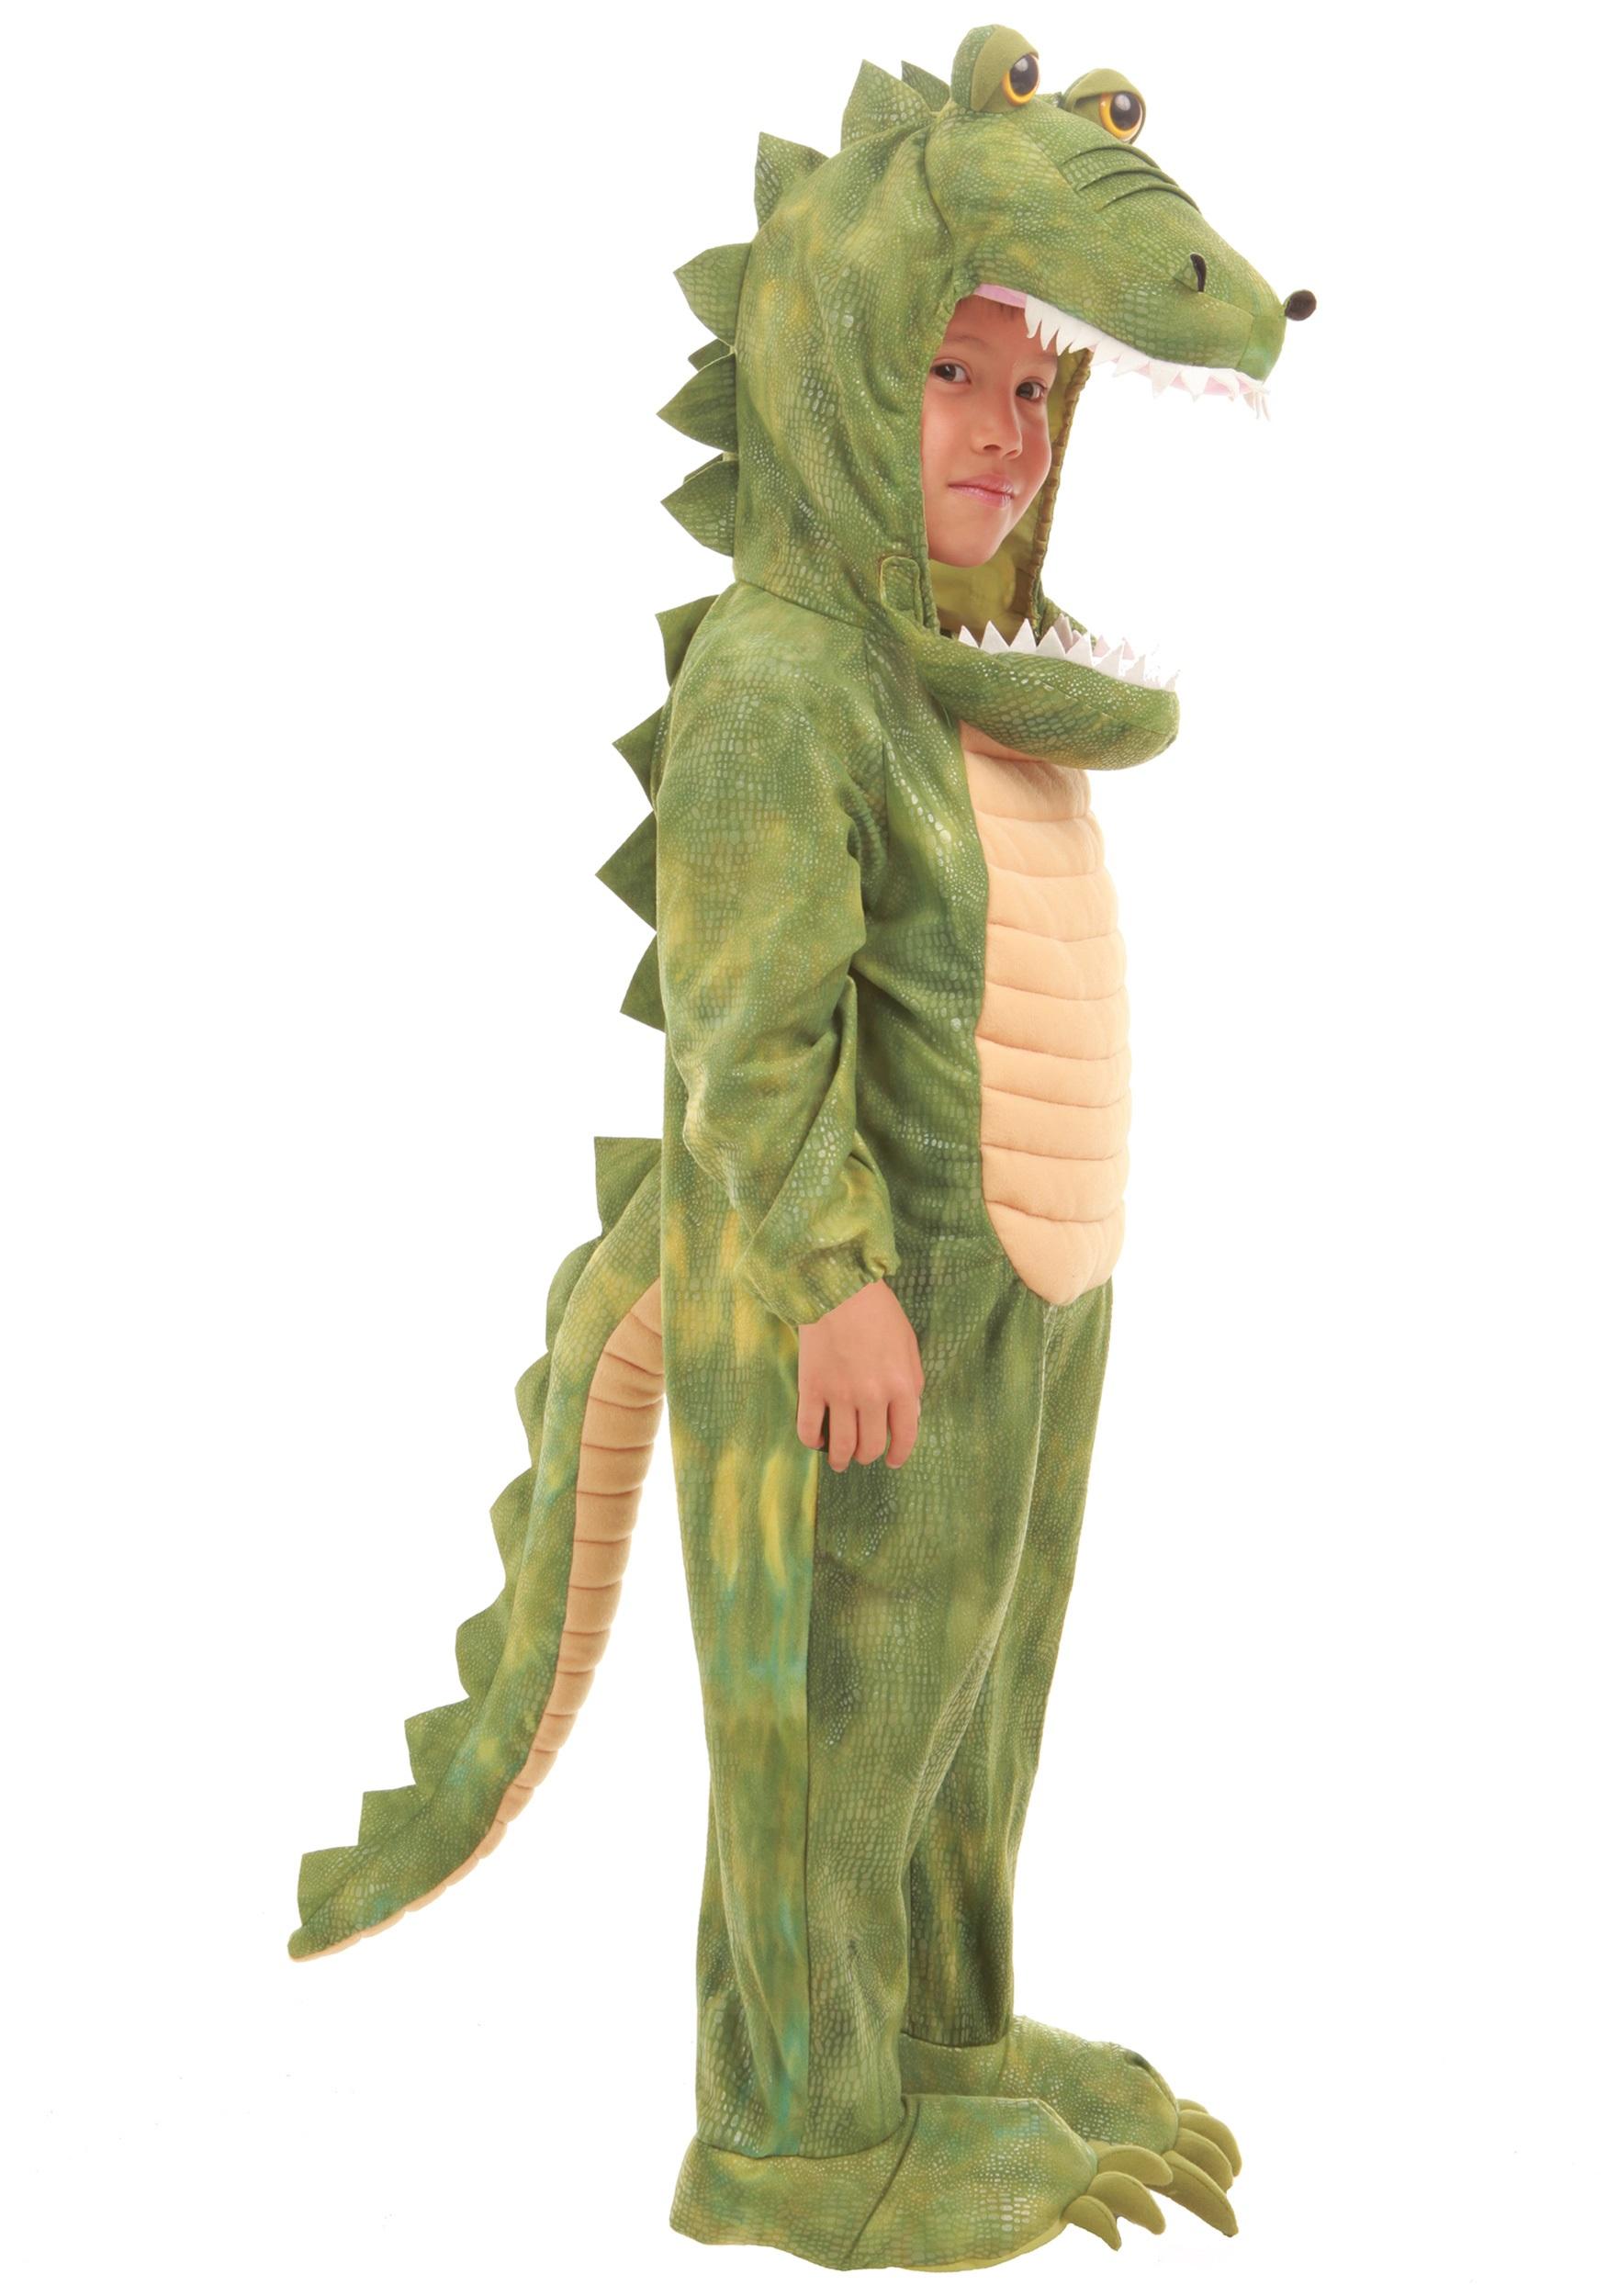 Kids Alligator Costume  sc 1 st  Halloween Costumes & Kids Alligator Costume - Halloween Costumes